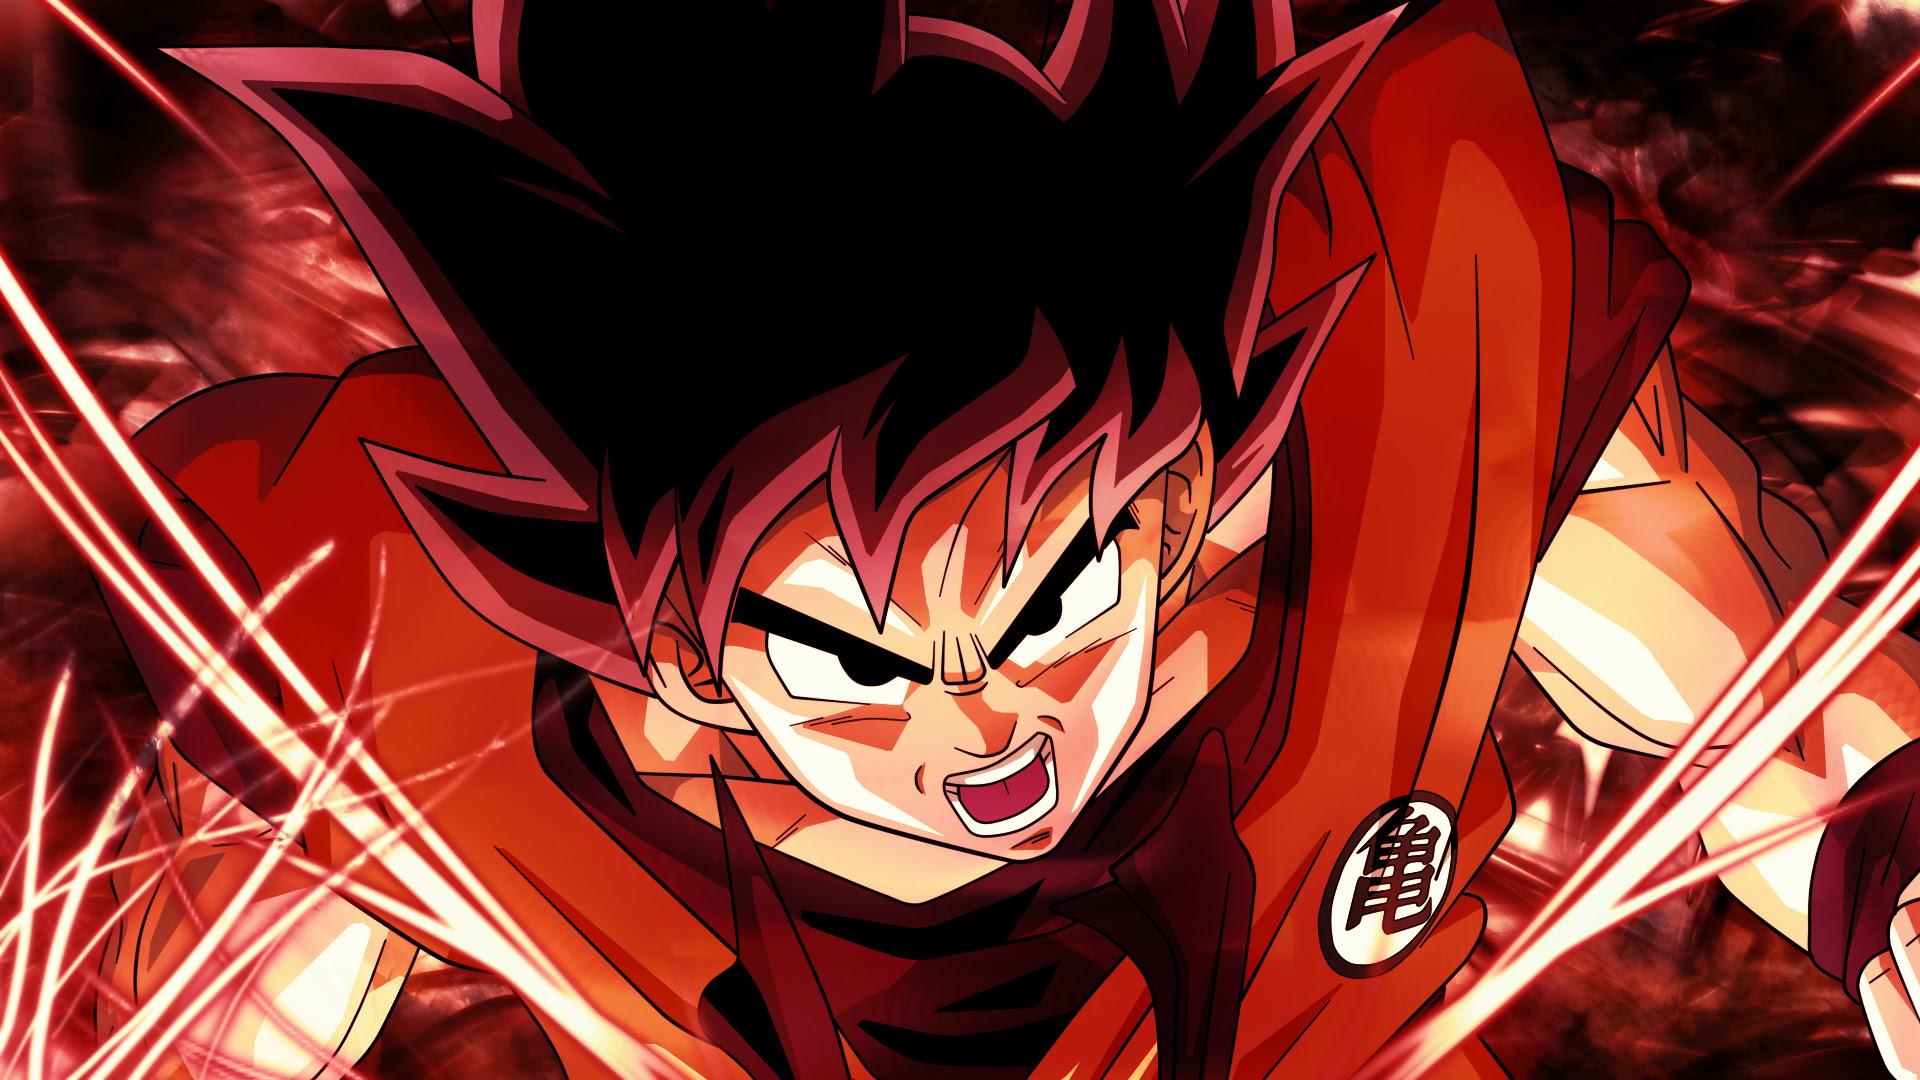 Goku Wallpaper 1920x1080 82614